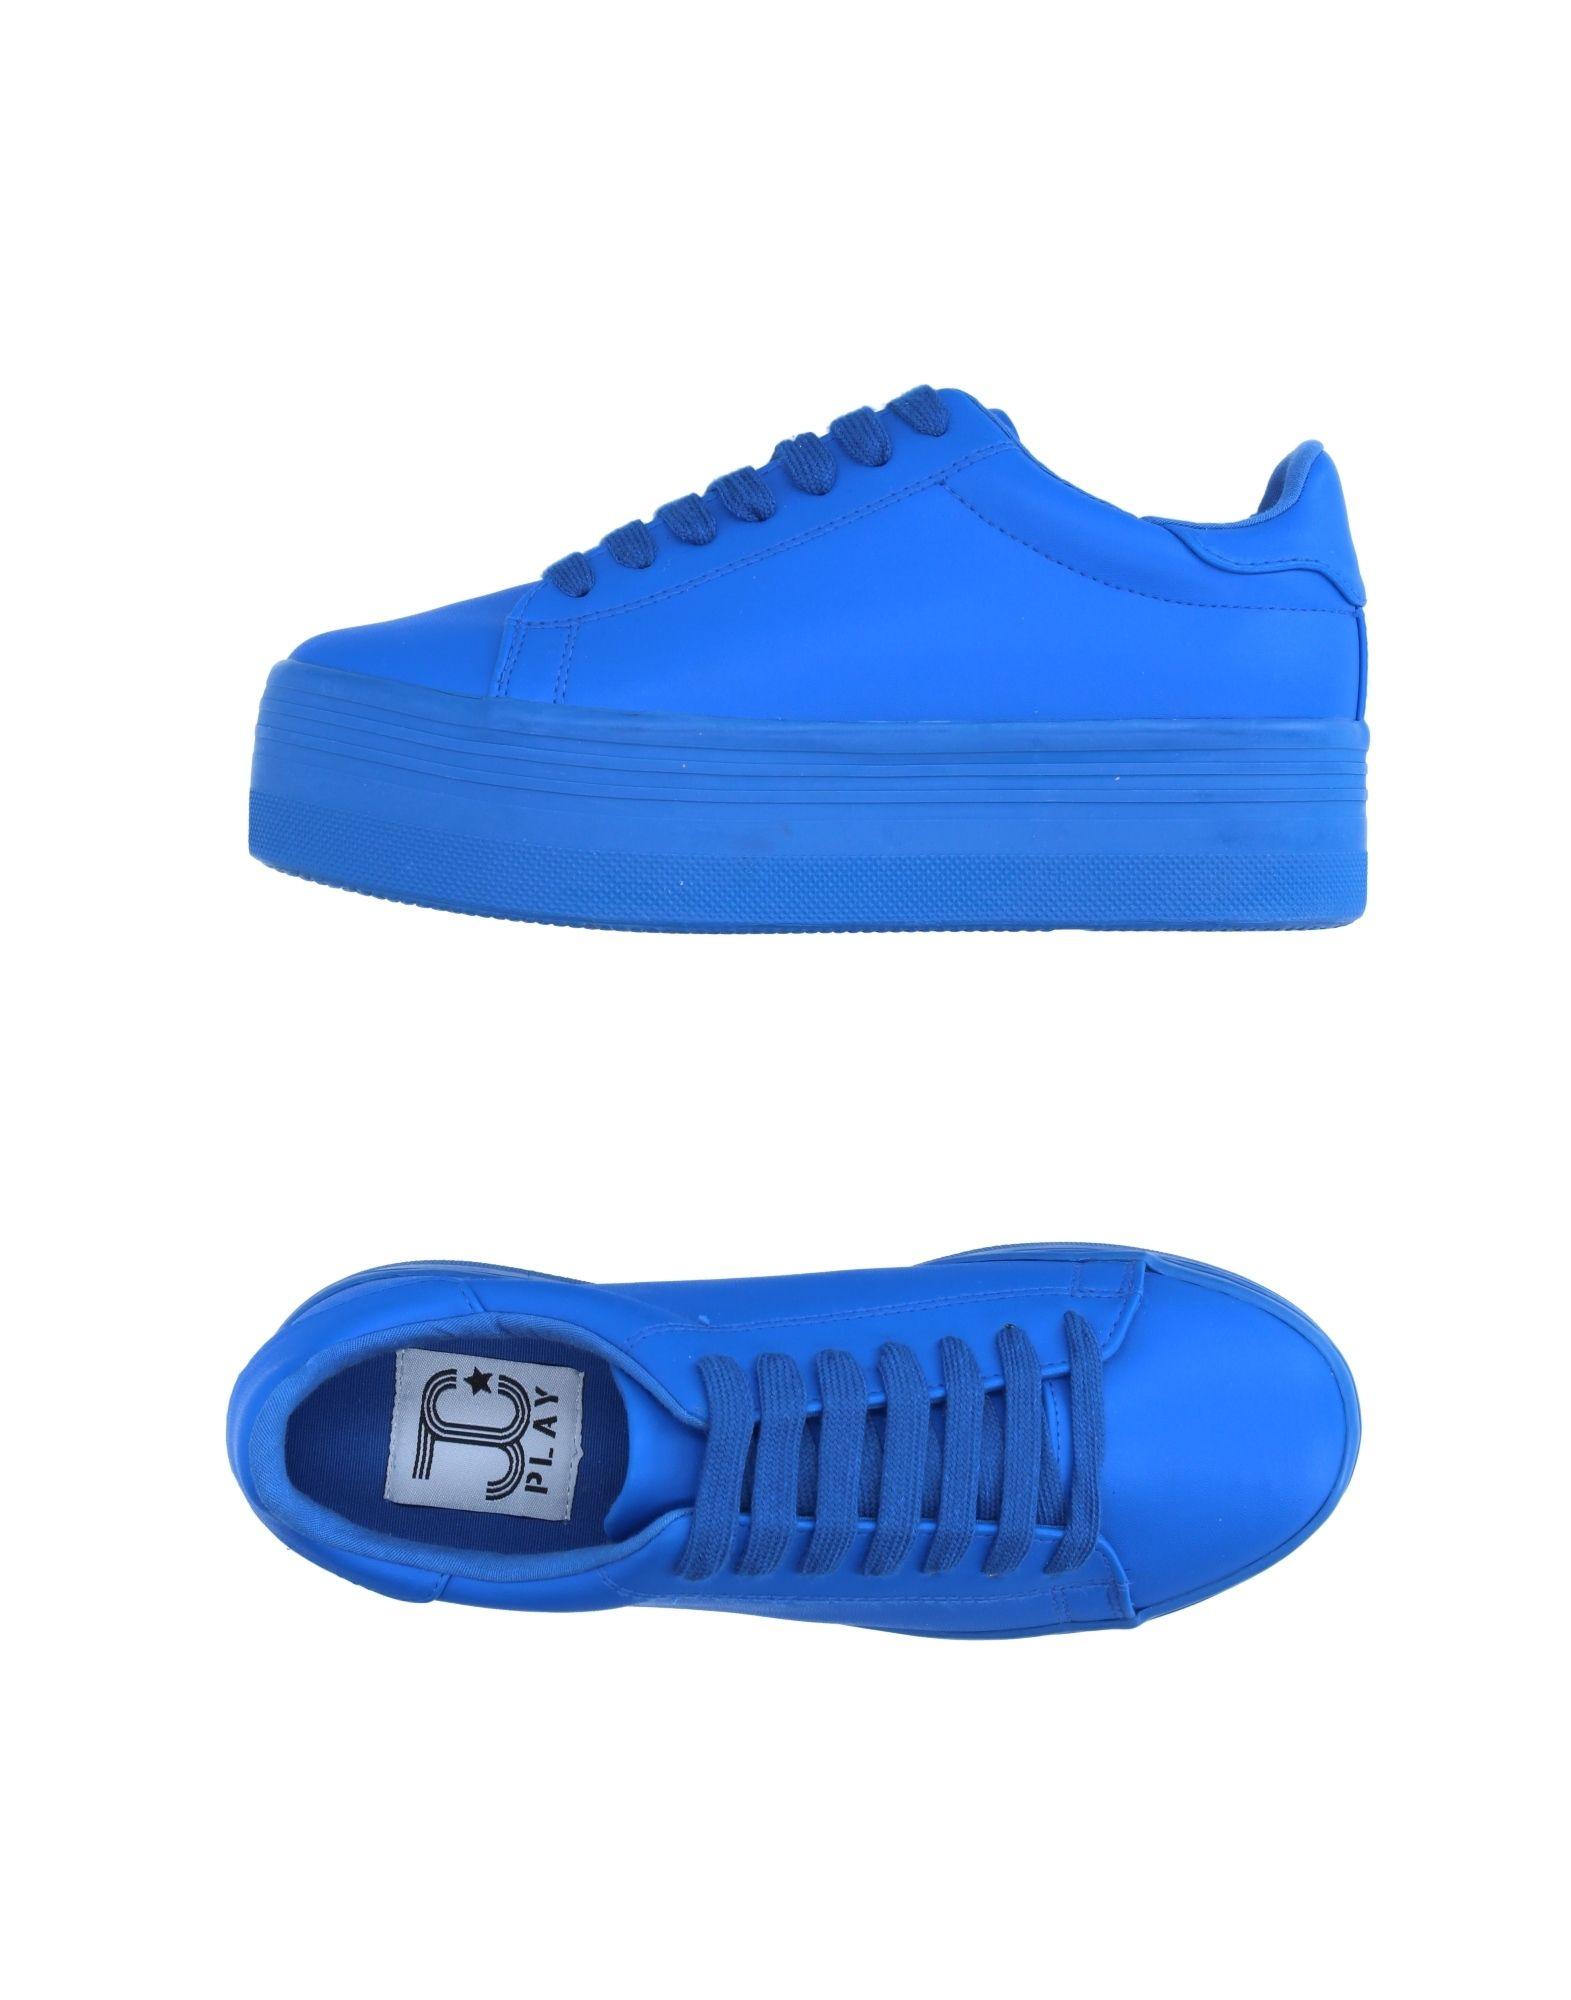 Jc Play By Jeffrey Campbell Sneakers Damen  11252843XX Heiße Schuhe